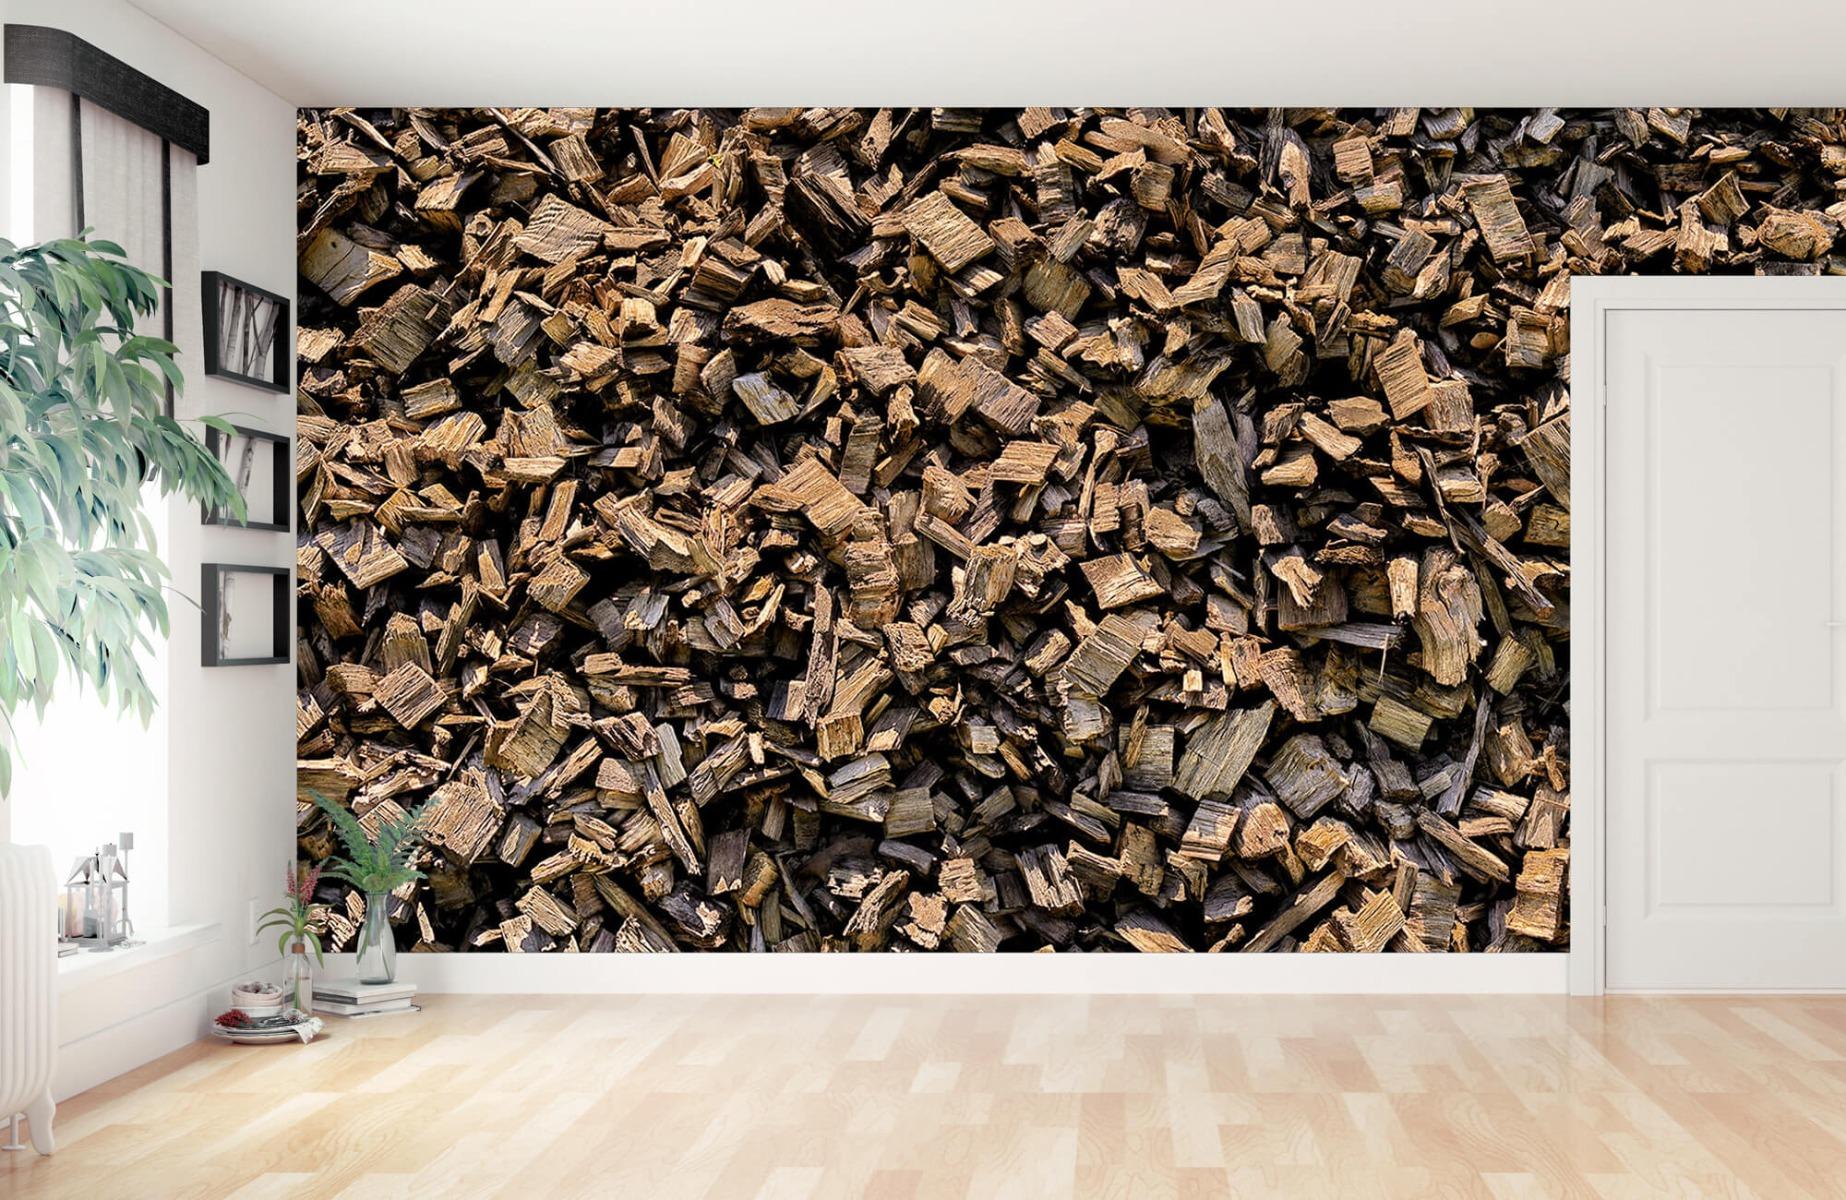 Hout behang - Houtsnippers - Wallexclusive - Hobbykamer 11